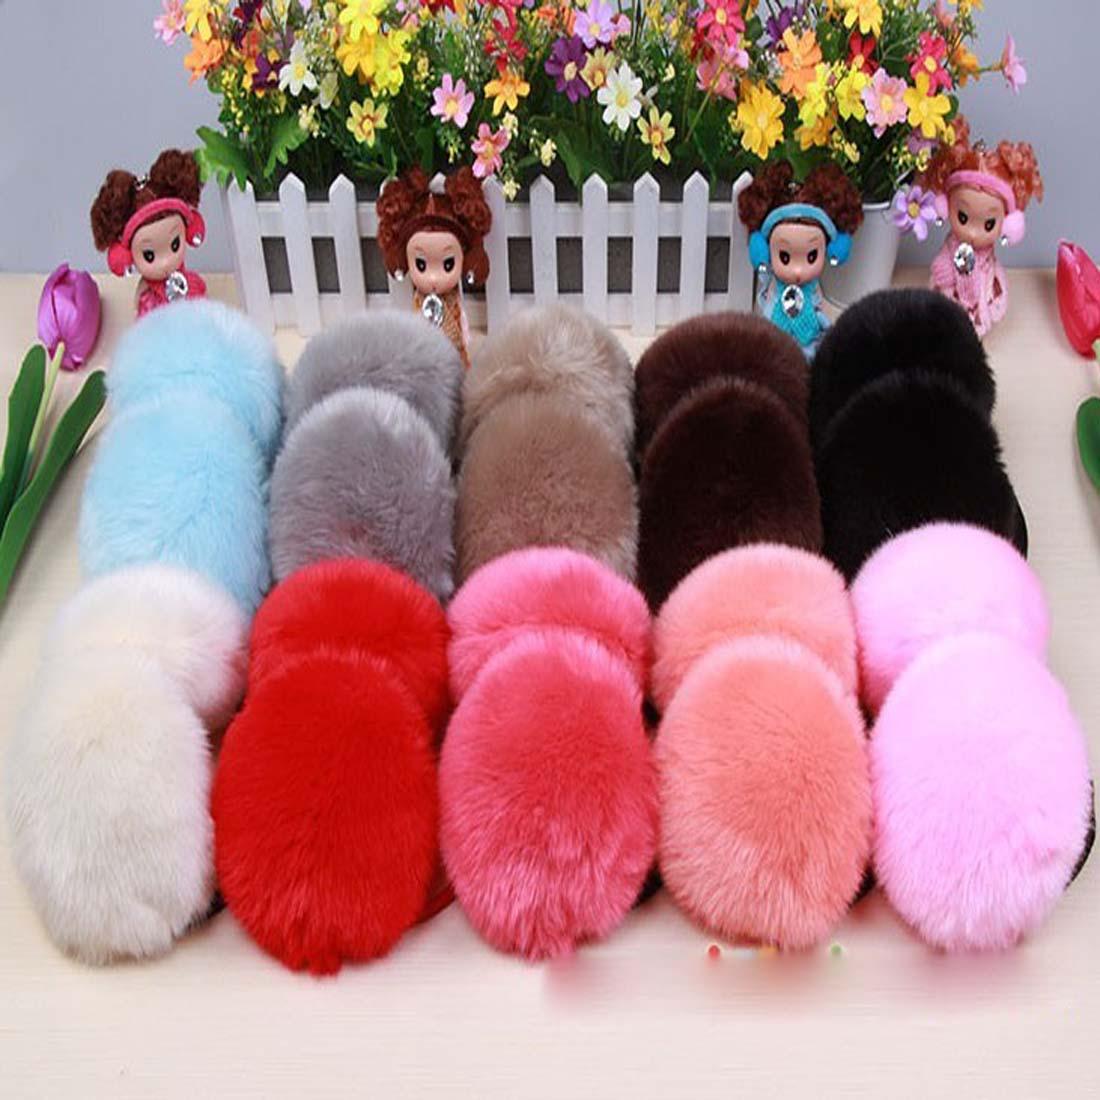 Fashion Warm Cute Plush Fuzzy Faux Ears Earmuffs Thick Student Ear Muffs Solid Girls Headband Ears Soft Winter Accessories